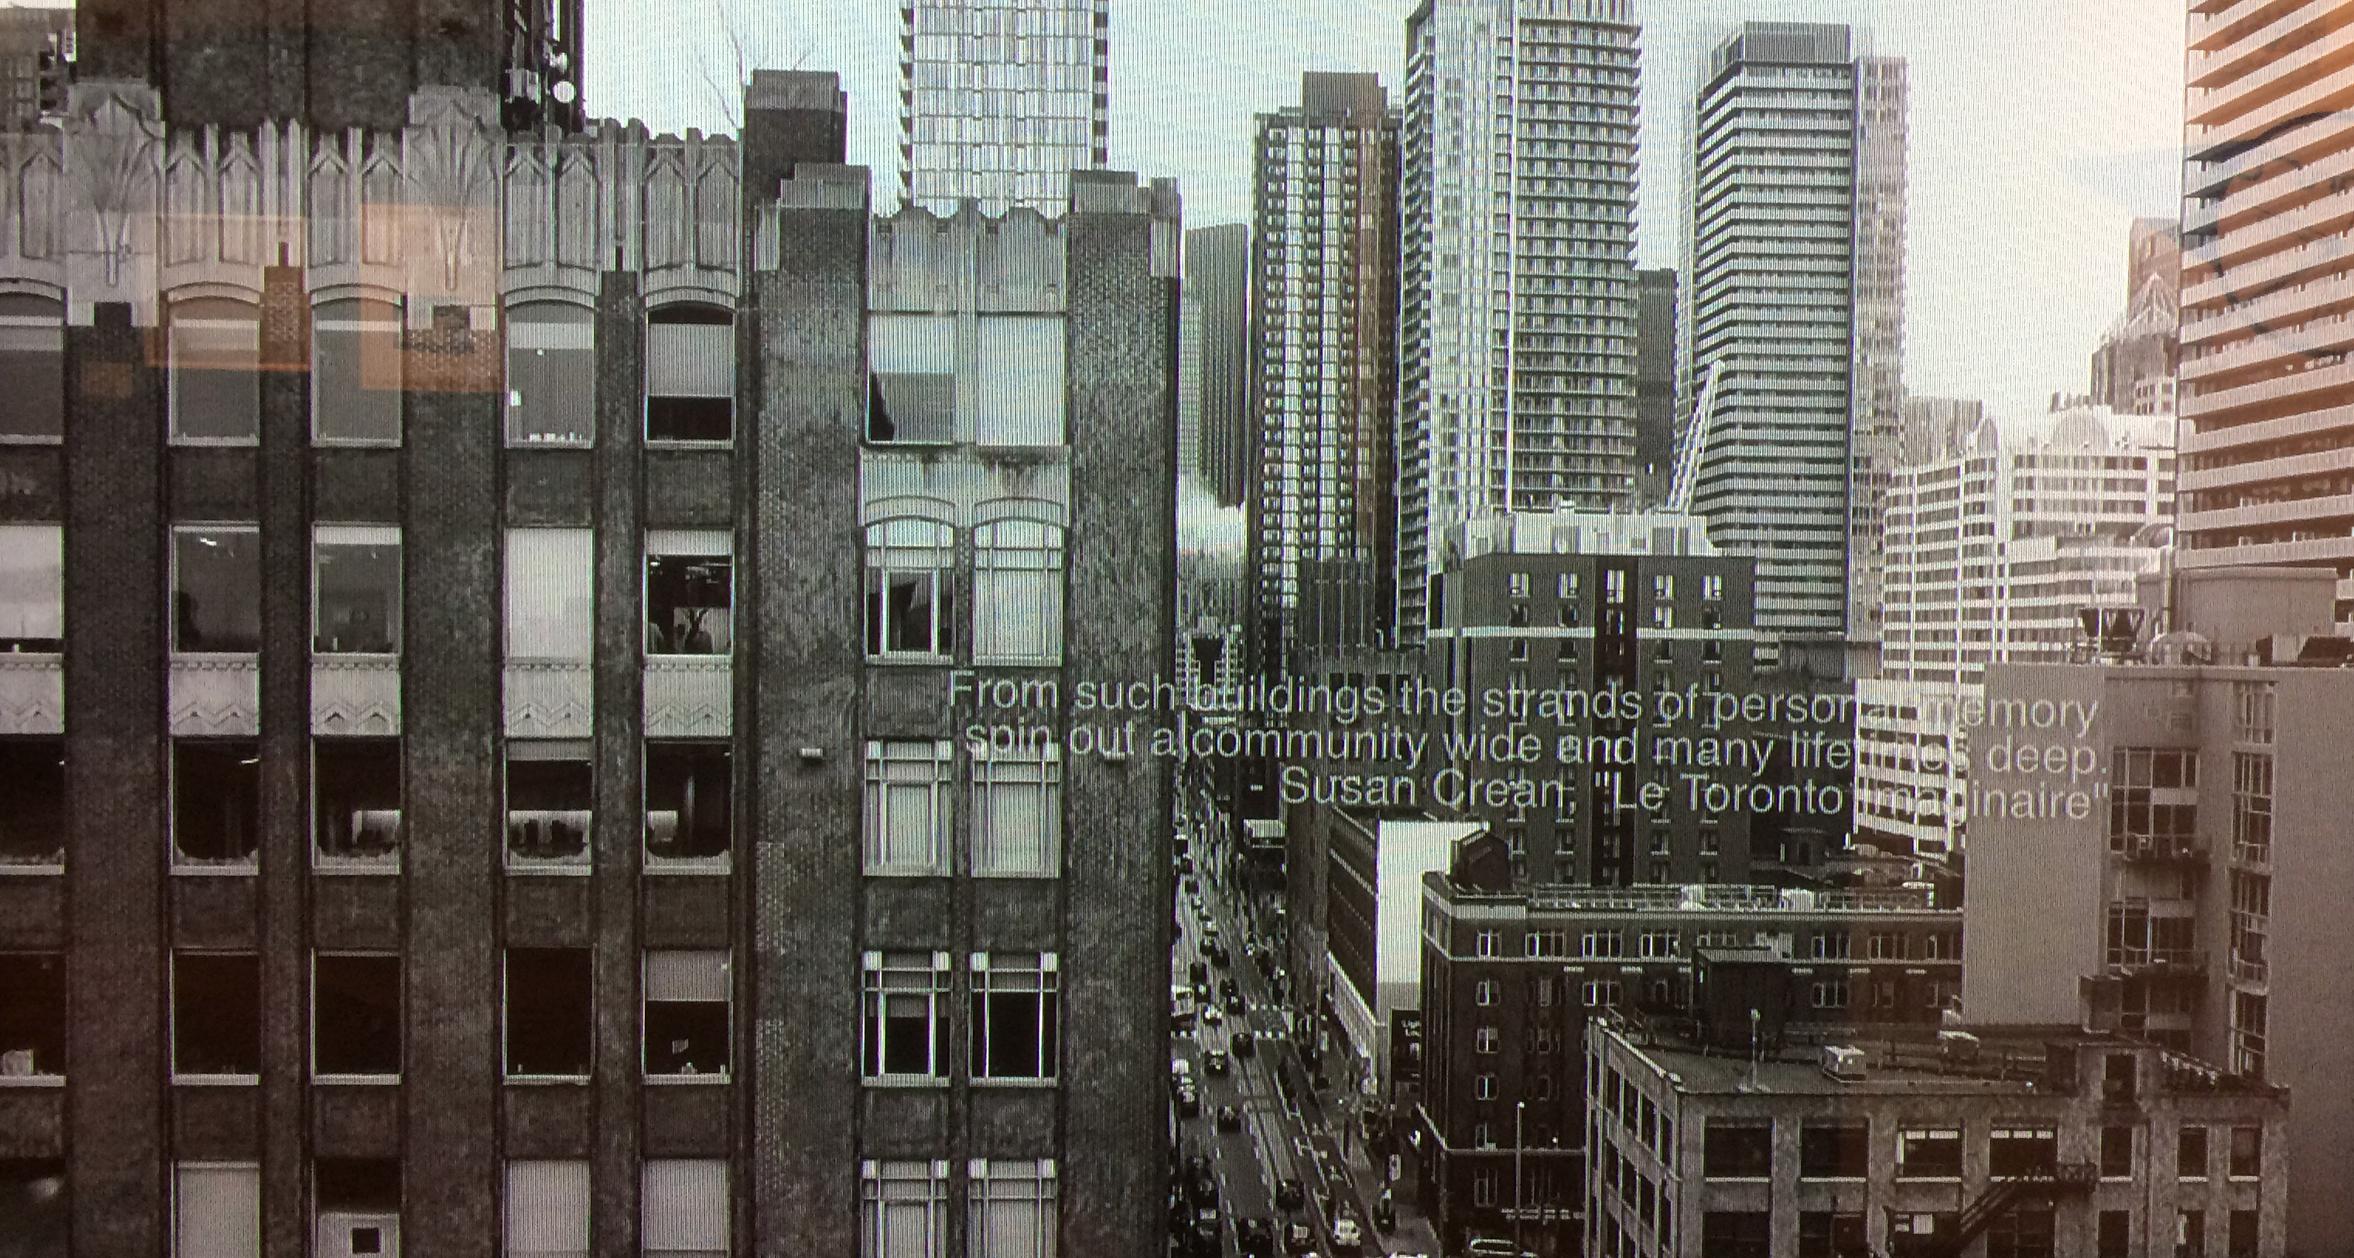 Balfour Building Screen Shot 2016-12-23 at 2.43.41 PM.png